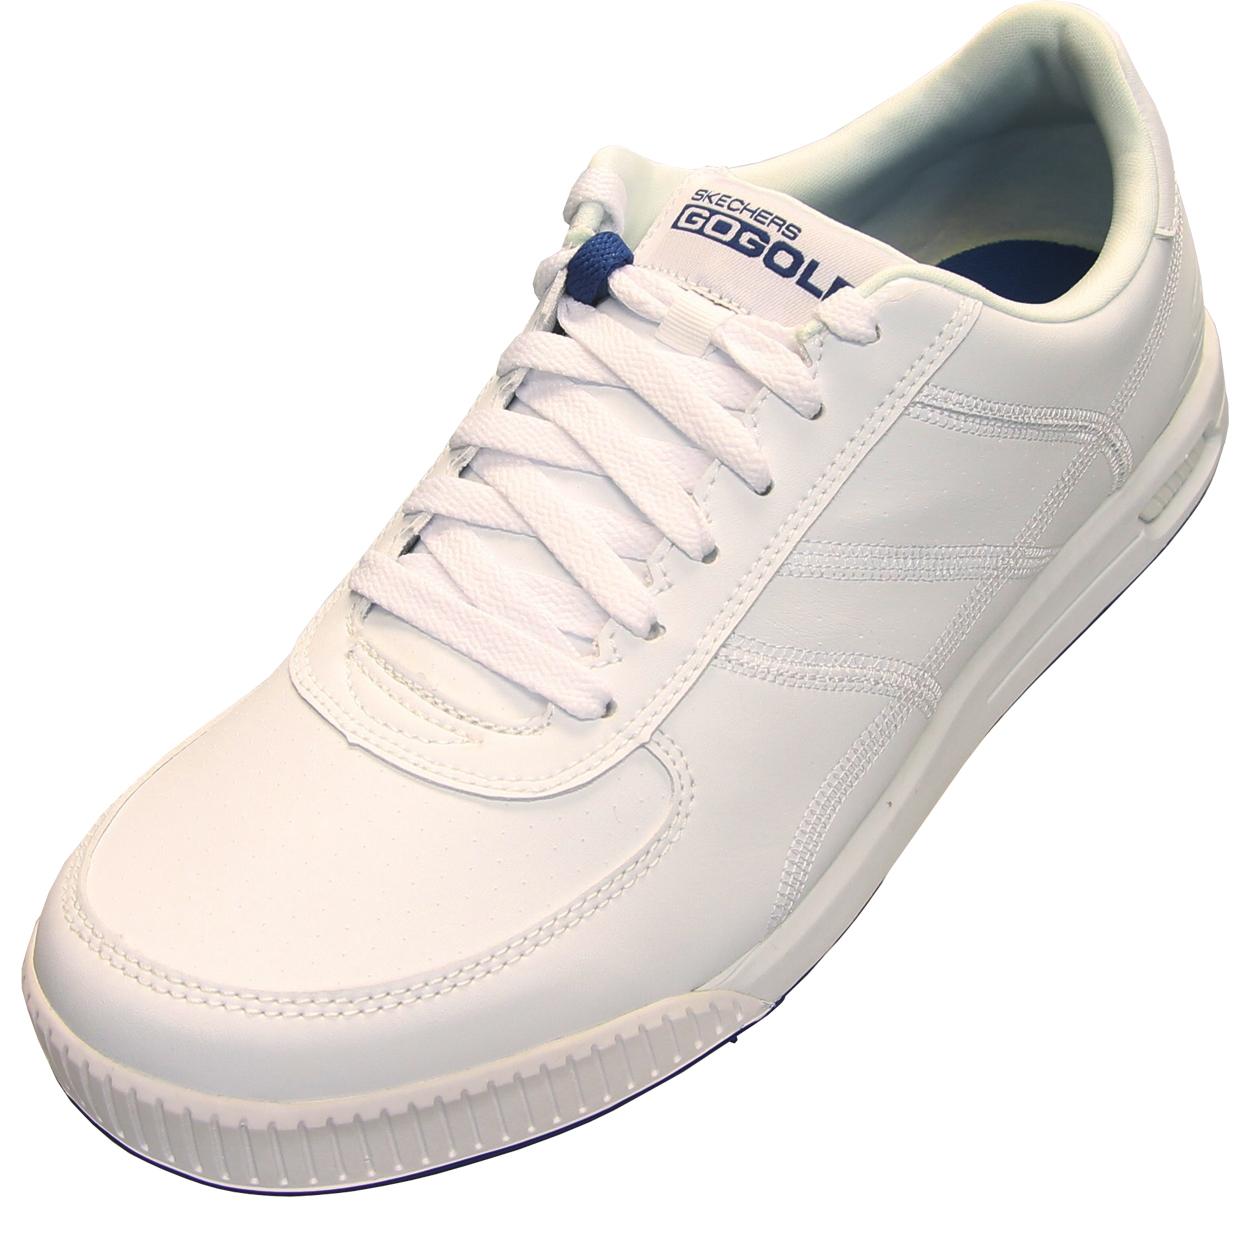 275f21529c98 Skechers GOgolf Drive Classic Spikeless Shoe - GolfEtail.com